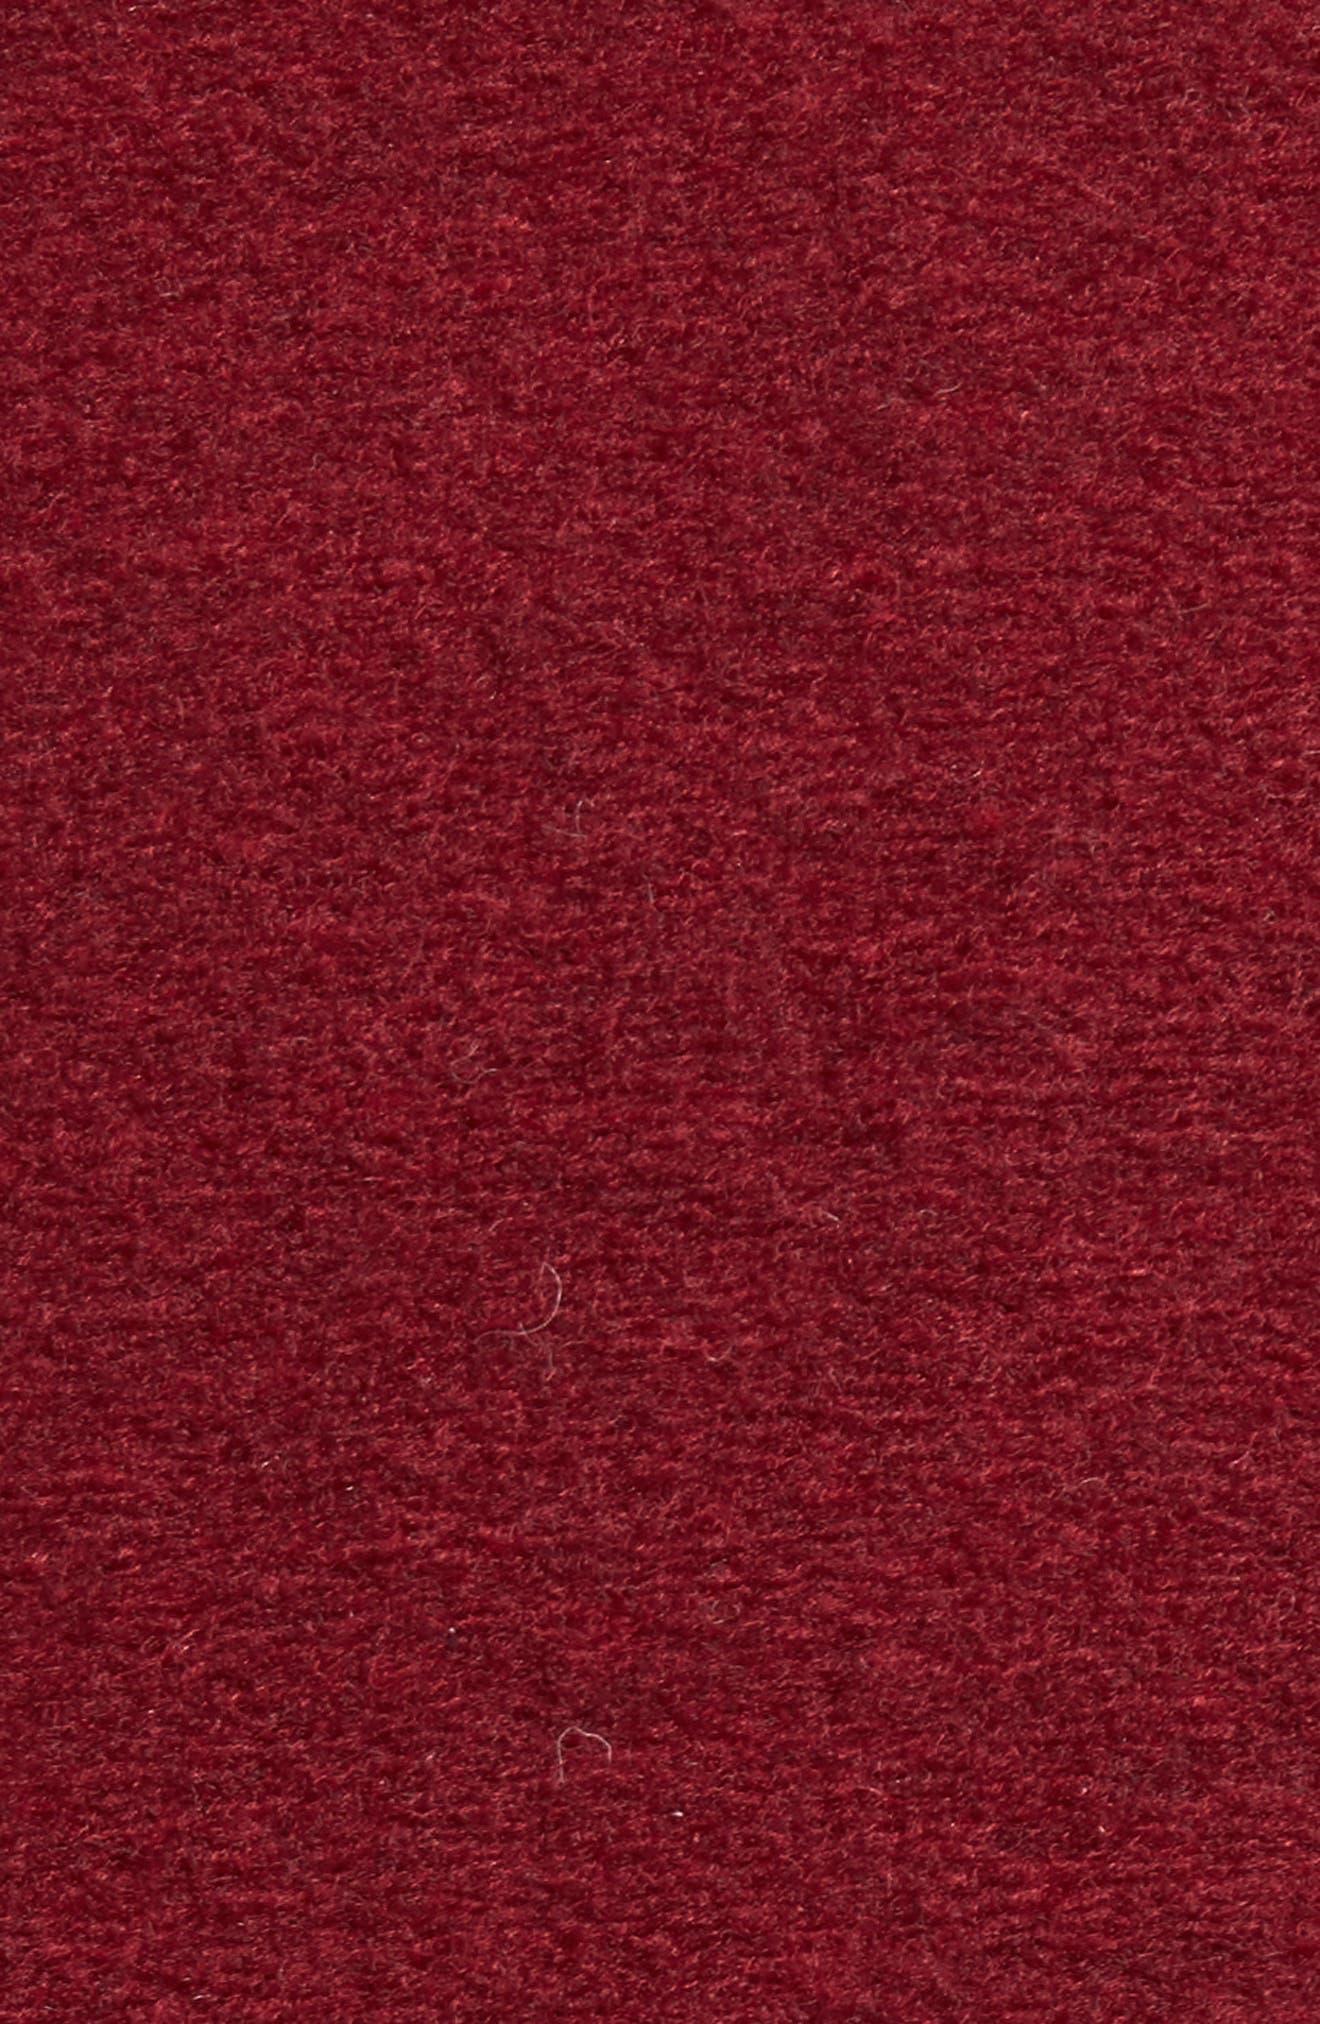 Cambridge Jacket,                             Alternate thumbnail 6, color,                             930